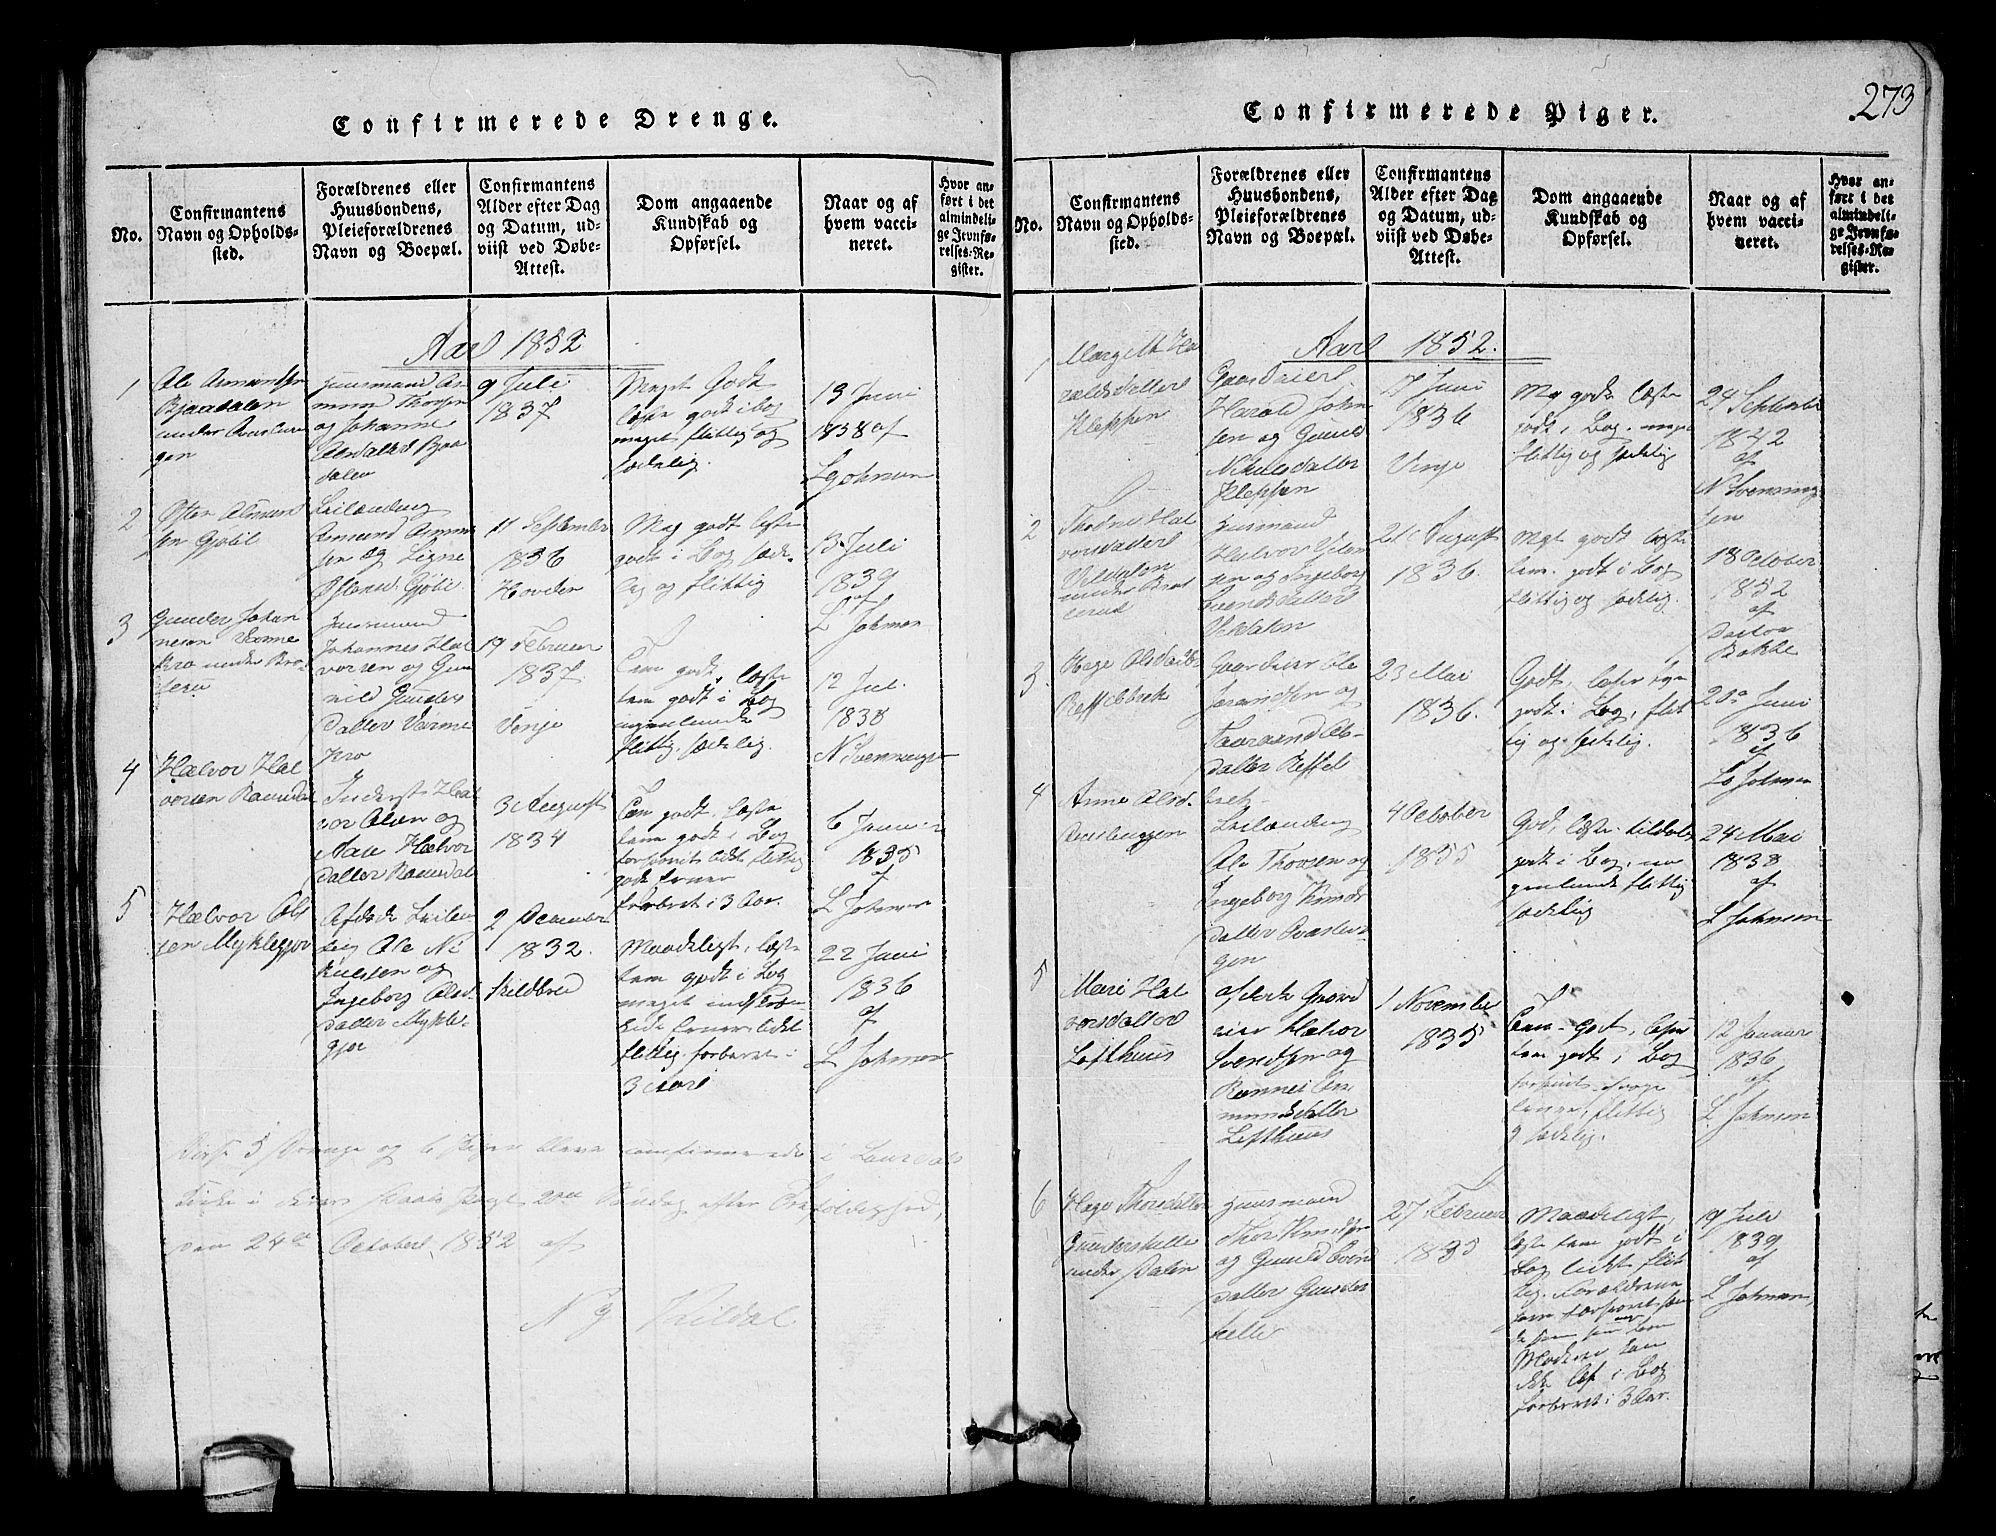 SAKO, Lårdal kirkebøker, G/Gb/L0001: Klokkerbok nr. II 1, 1815-1865, s. 273